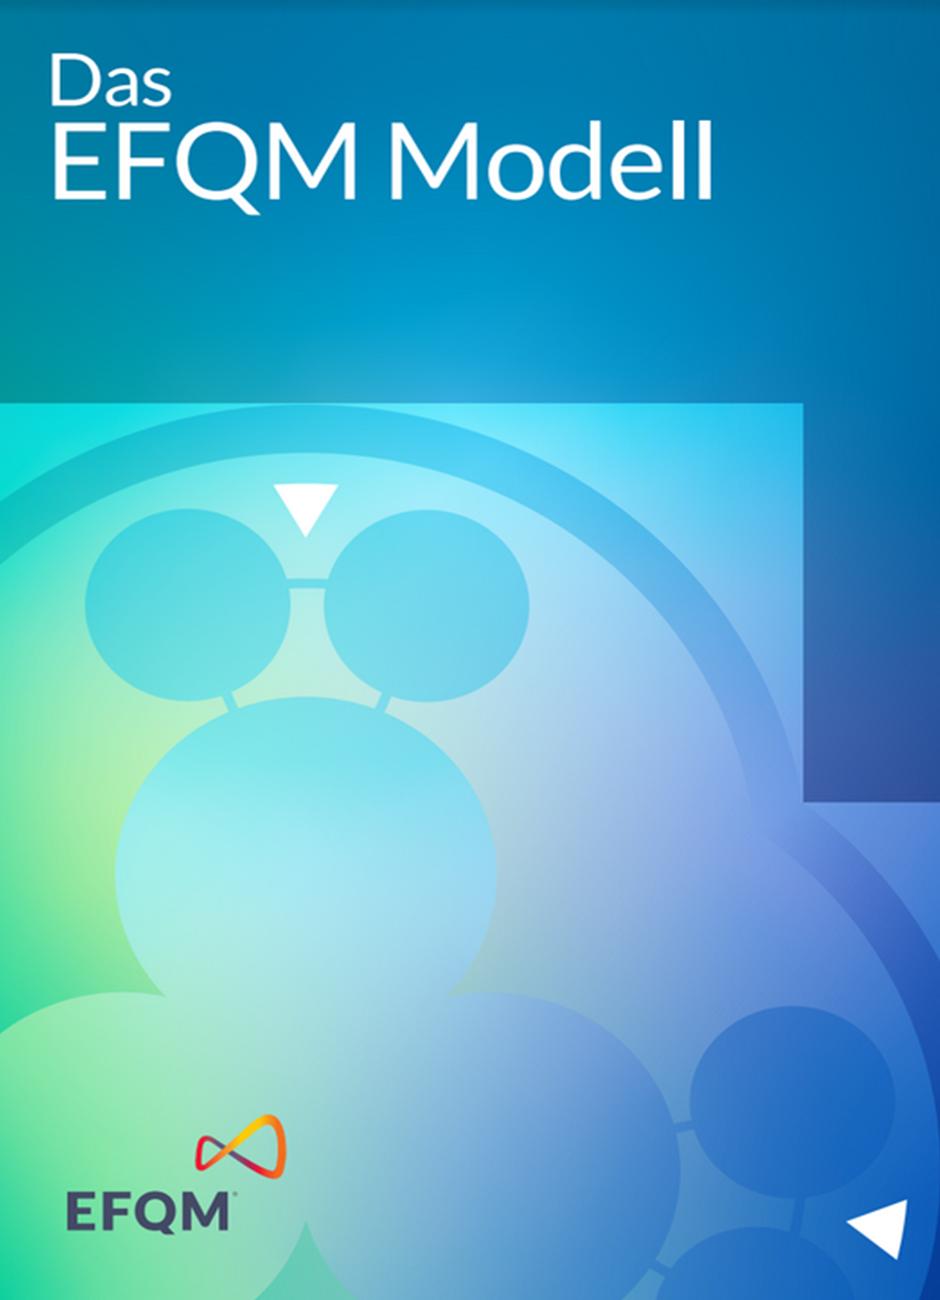 EFQM Modell 2020